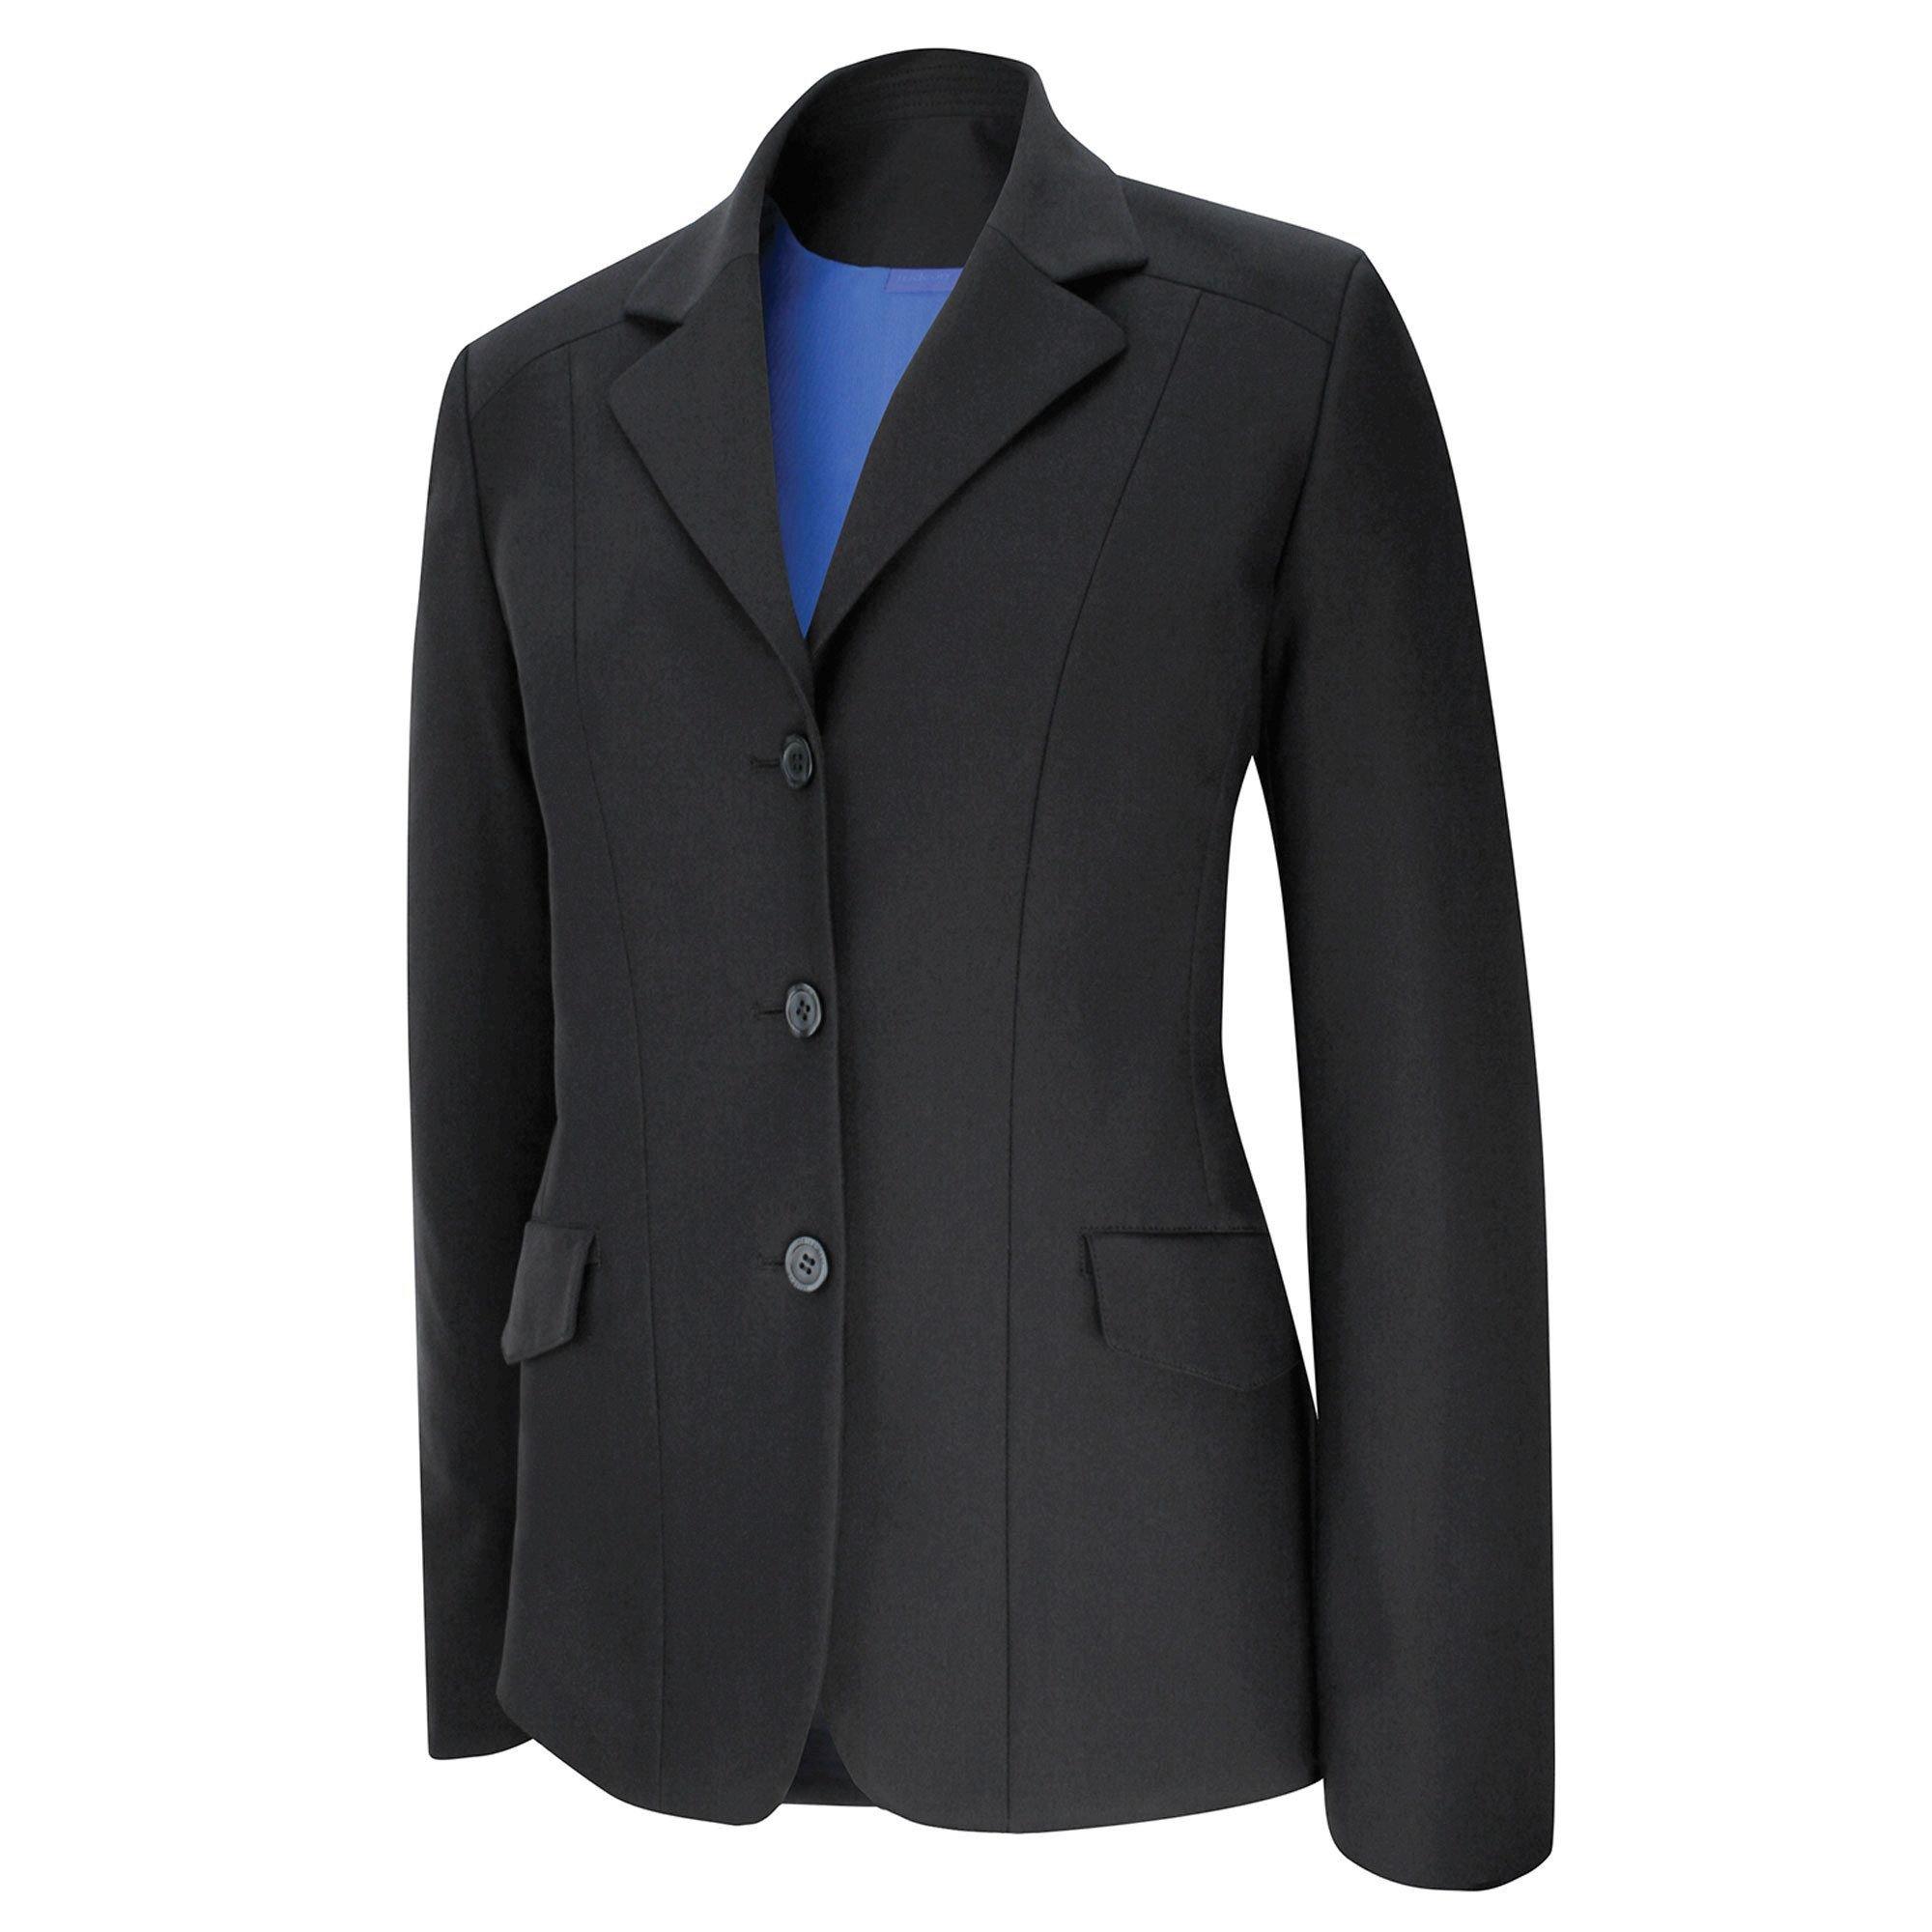 Irideon Kismet Show Coat Black - 04